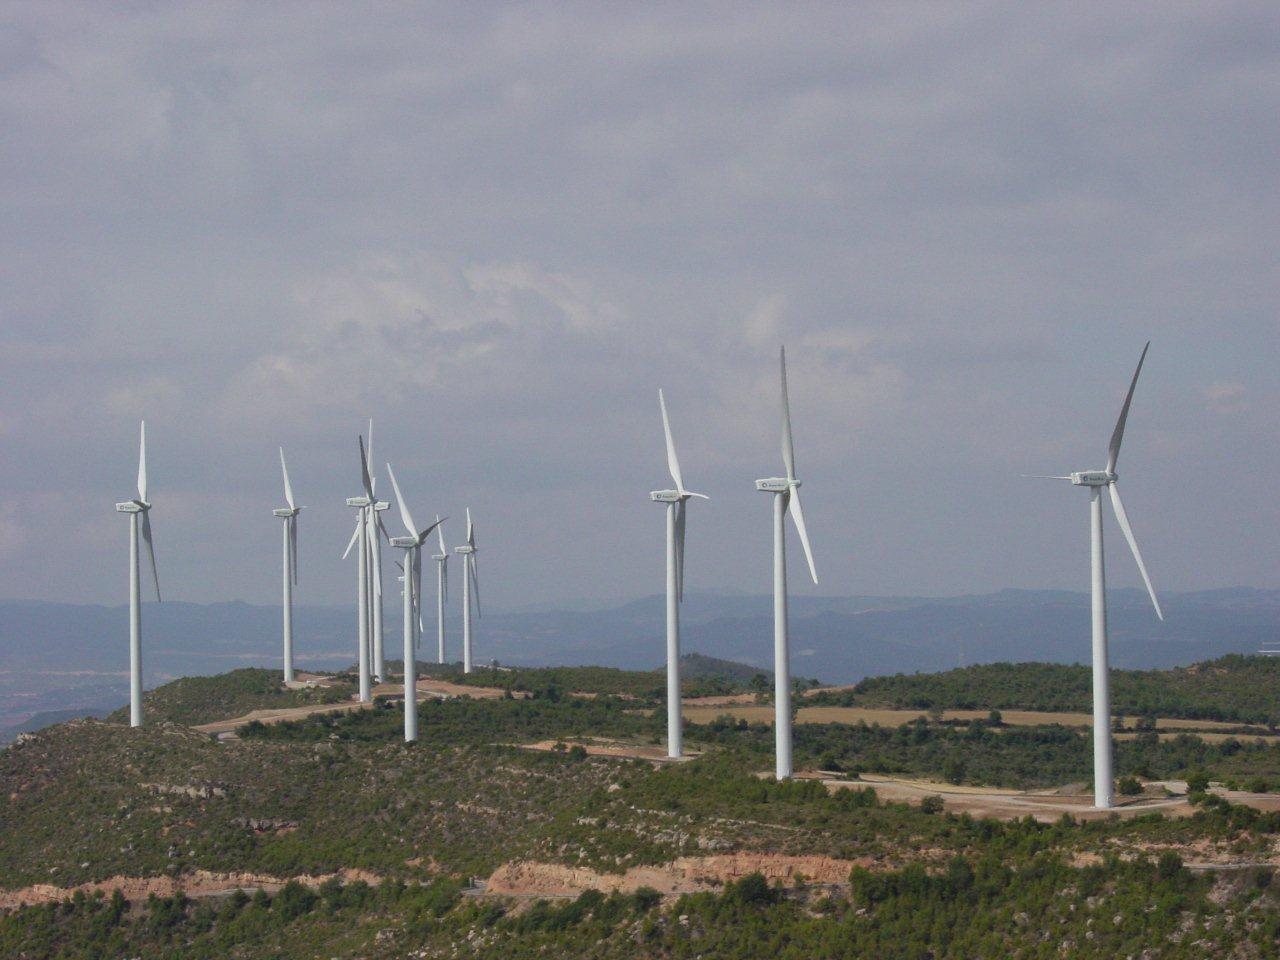 Eines per al consum sostenible a la udl - Serra bioclimatica normativa ...